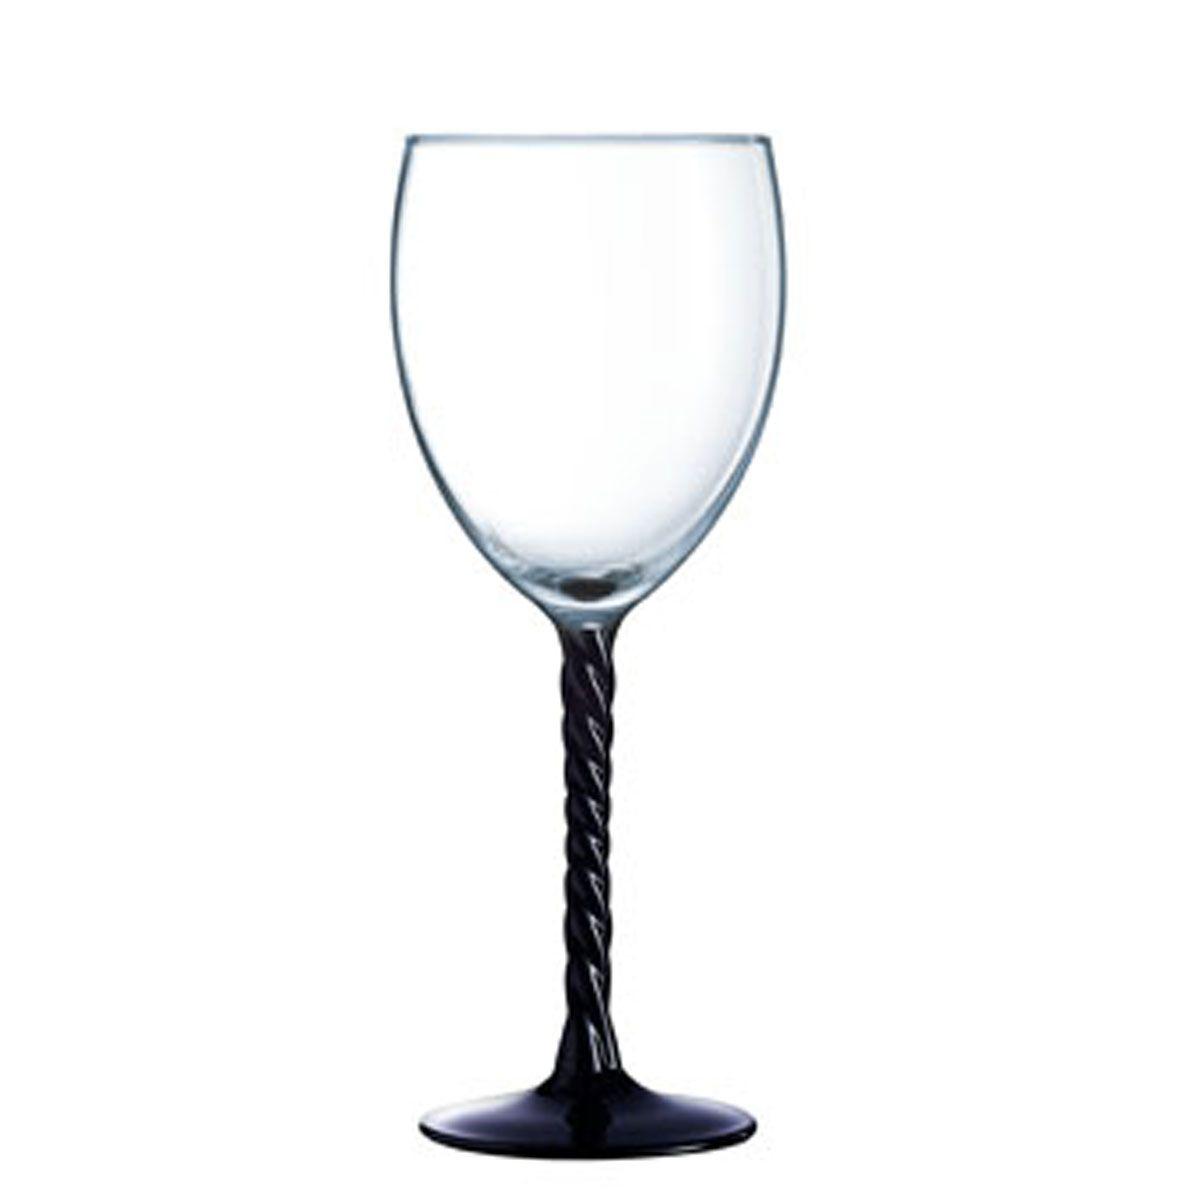 pied pour table en verre topiwall. Black Bedroom Furniture Sets. Home Design Ideas